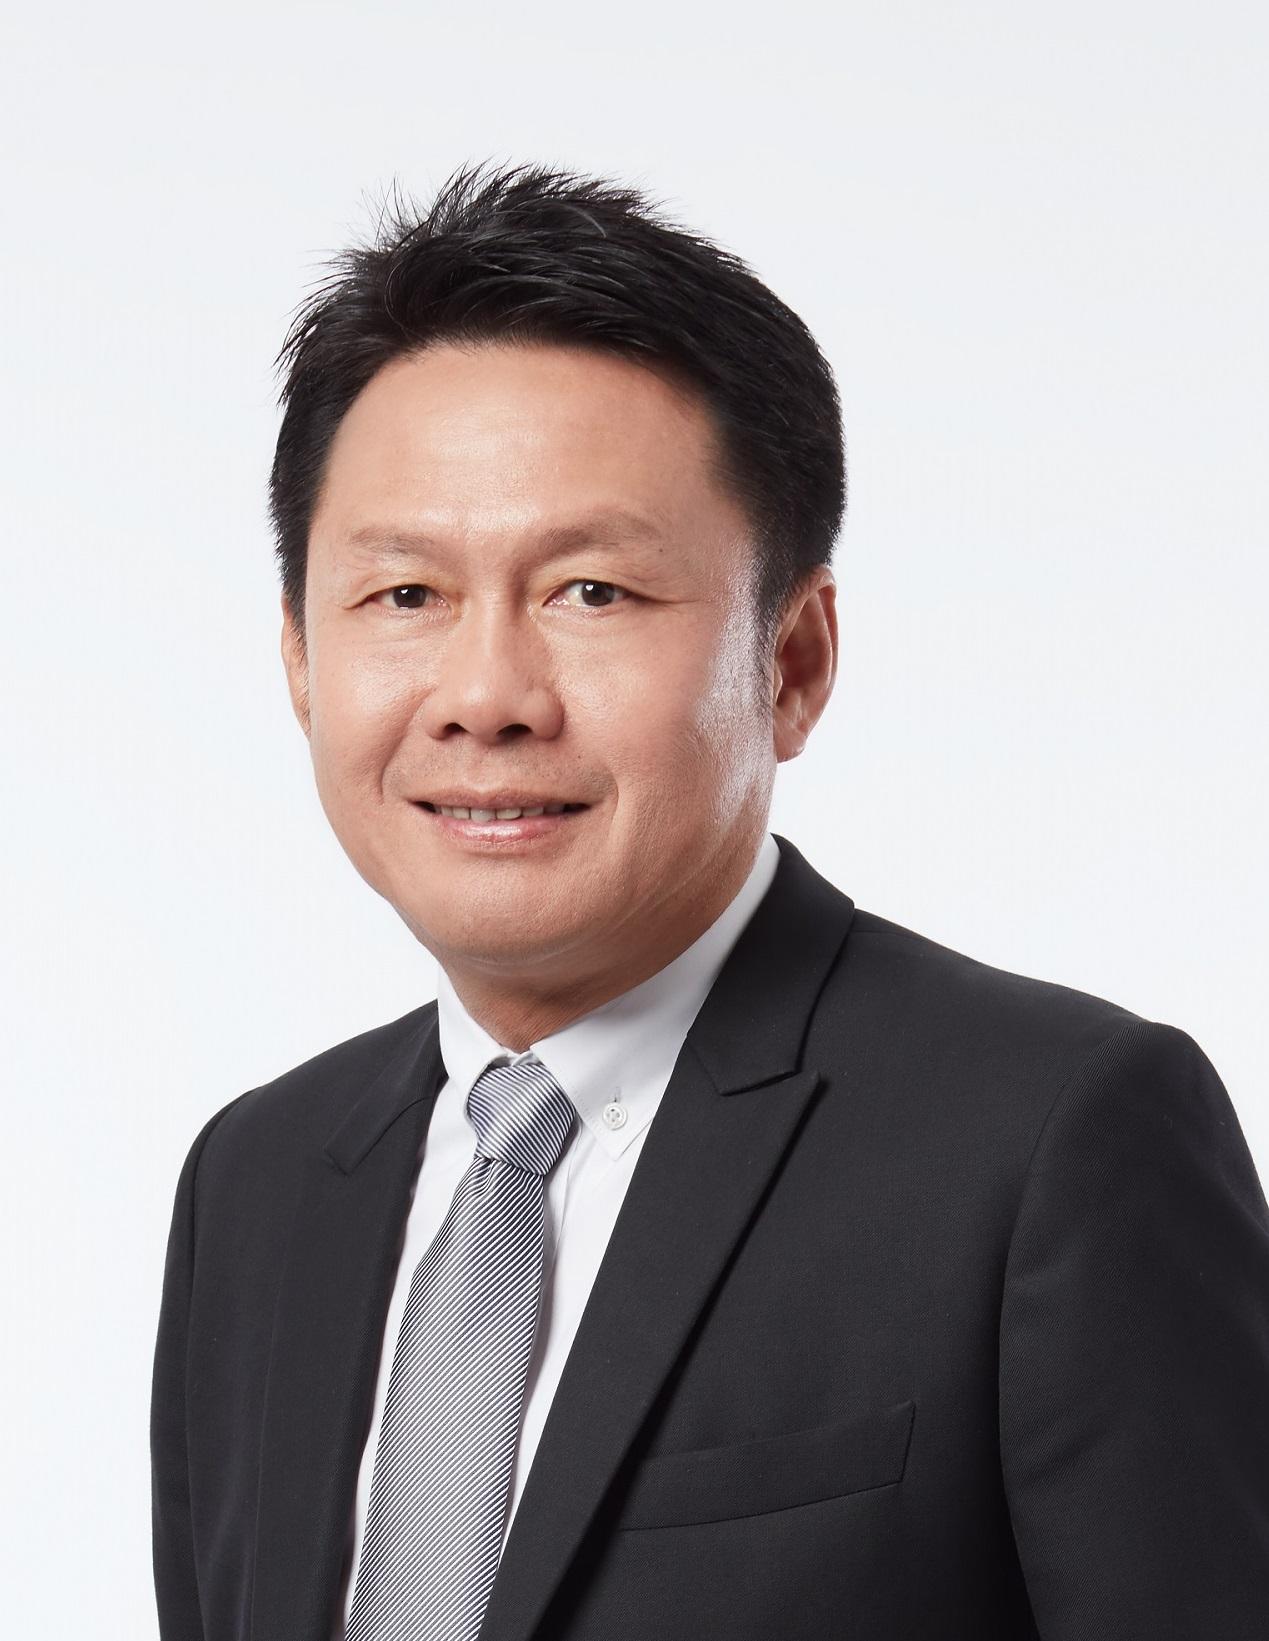 CV -Mr. Sakchai Patiparnpreechavud, Vice President-Polyolefins and Vinyl Business, SCG Chemicals Co., Ltd